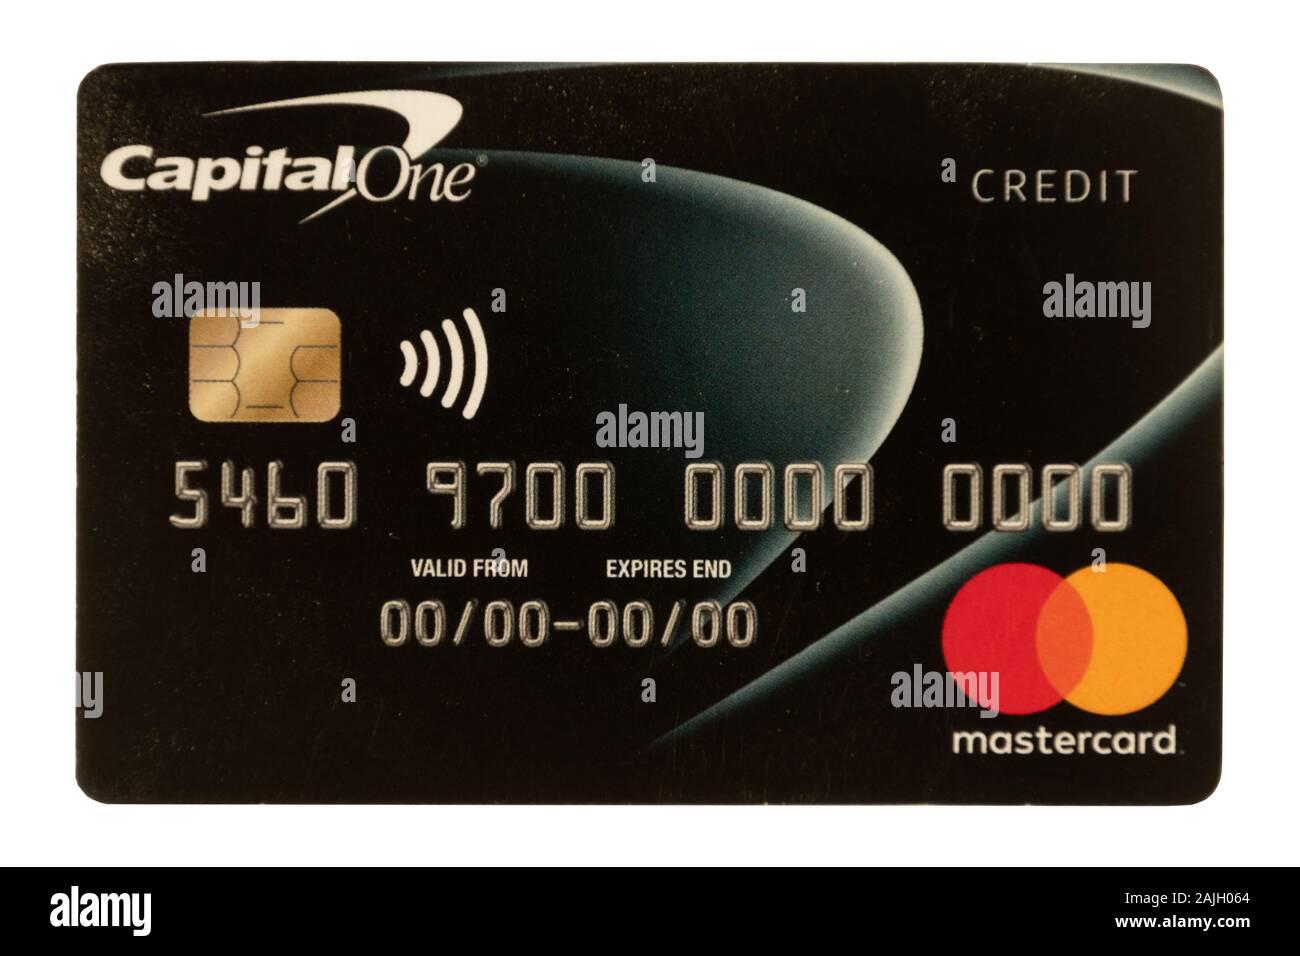 Capital One Mastercard Kreditkarte Stockfotografie - Alamy